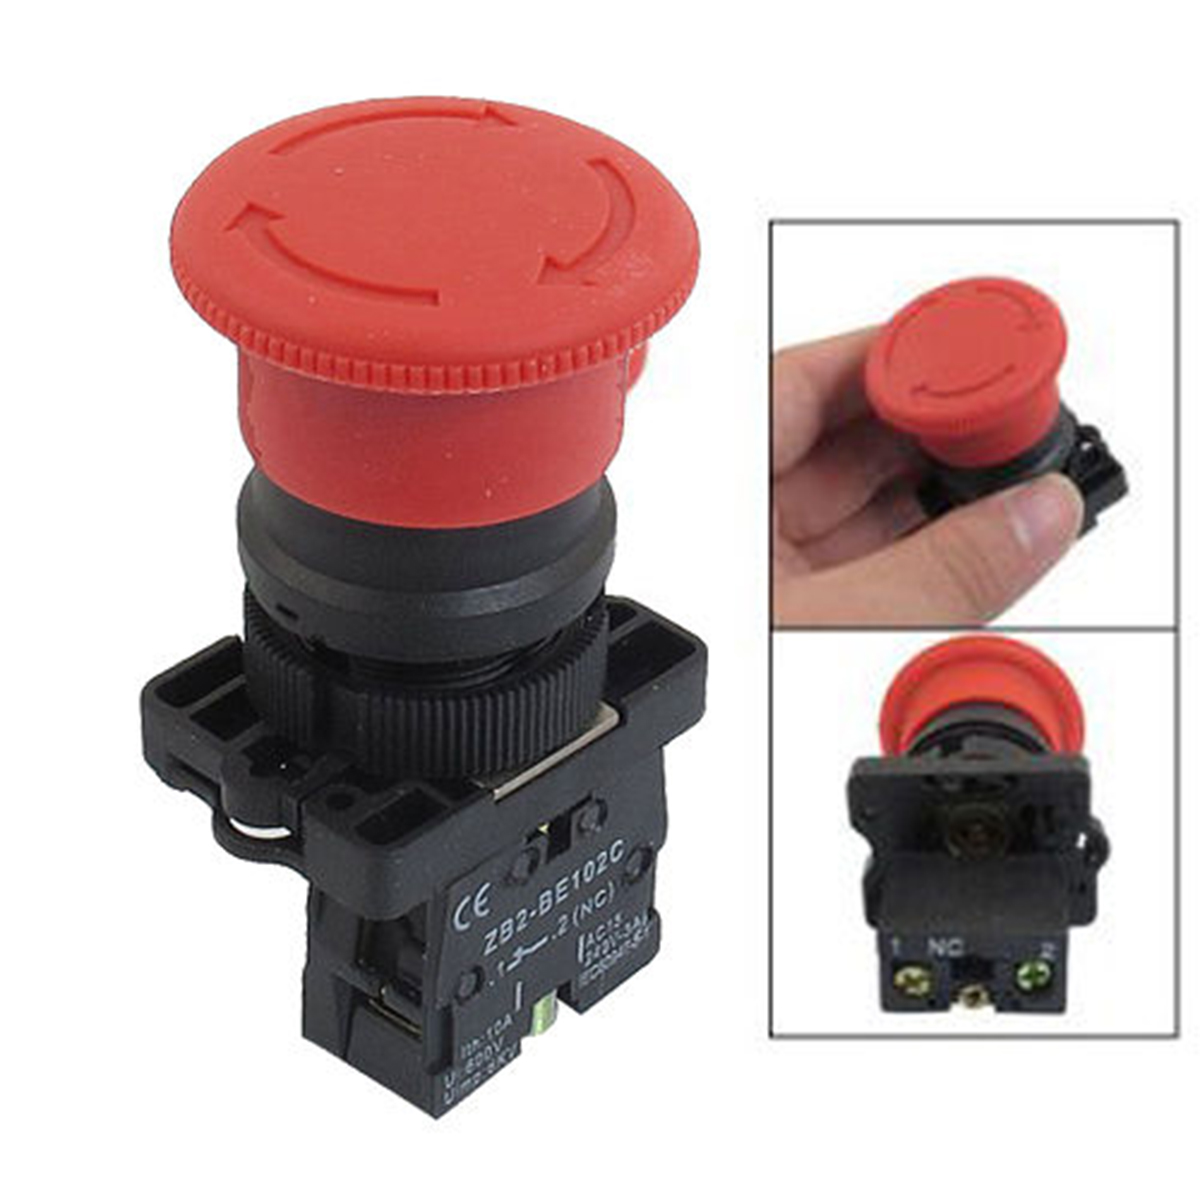 22mm Emergency Stop Mushroom Push Button Switch 600V 10A LA39 Series NO+NC